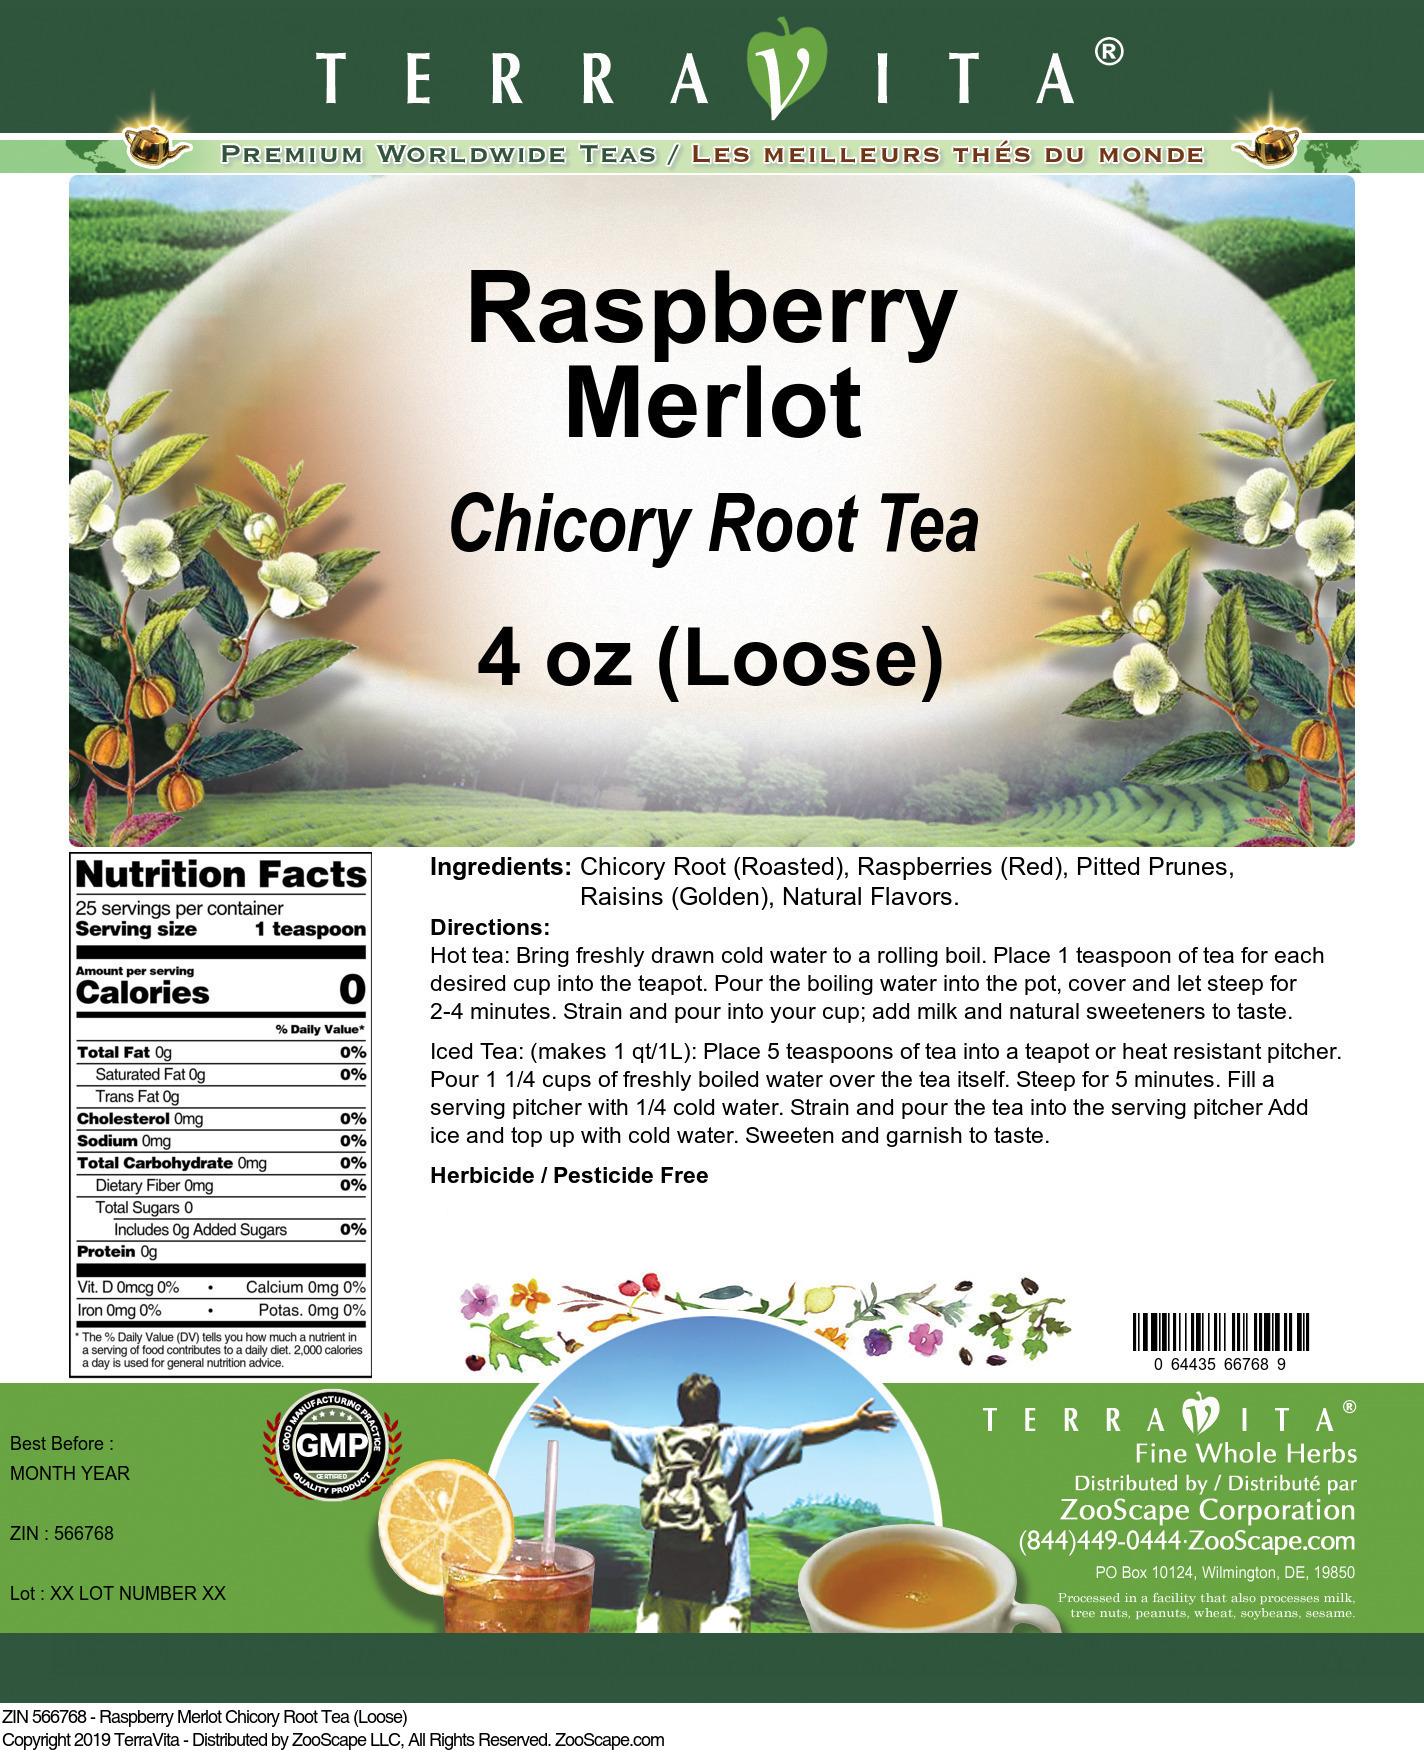 Raspberry Merlot Chicory Root Tea (Loose)